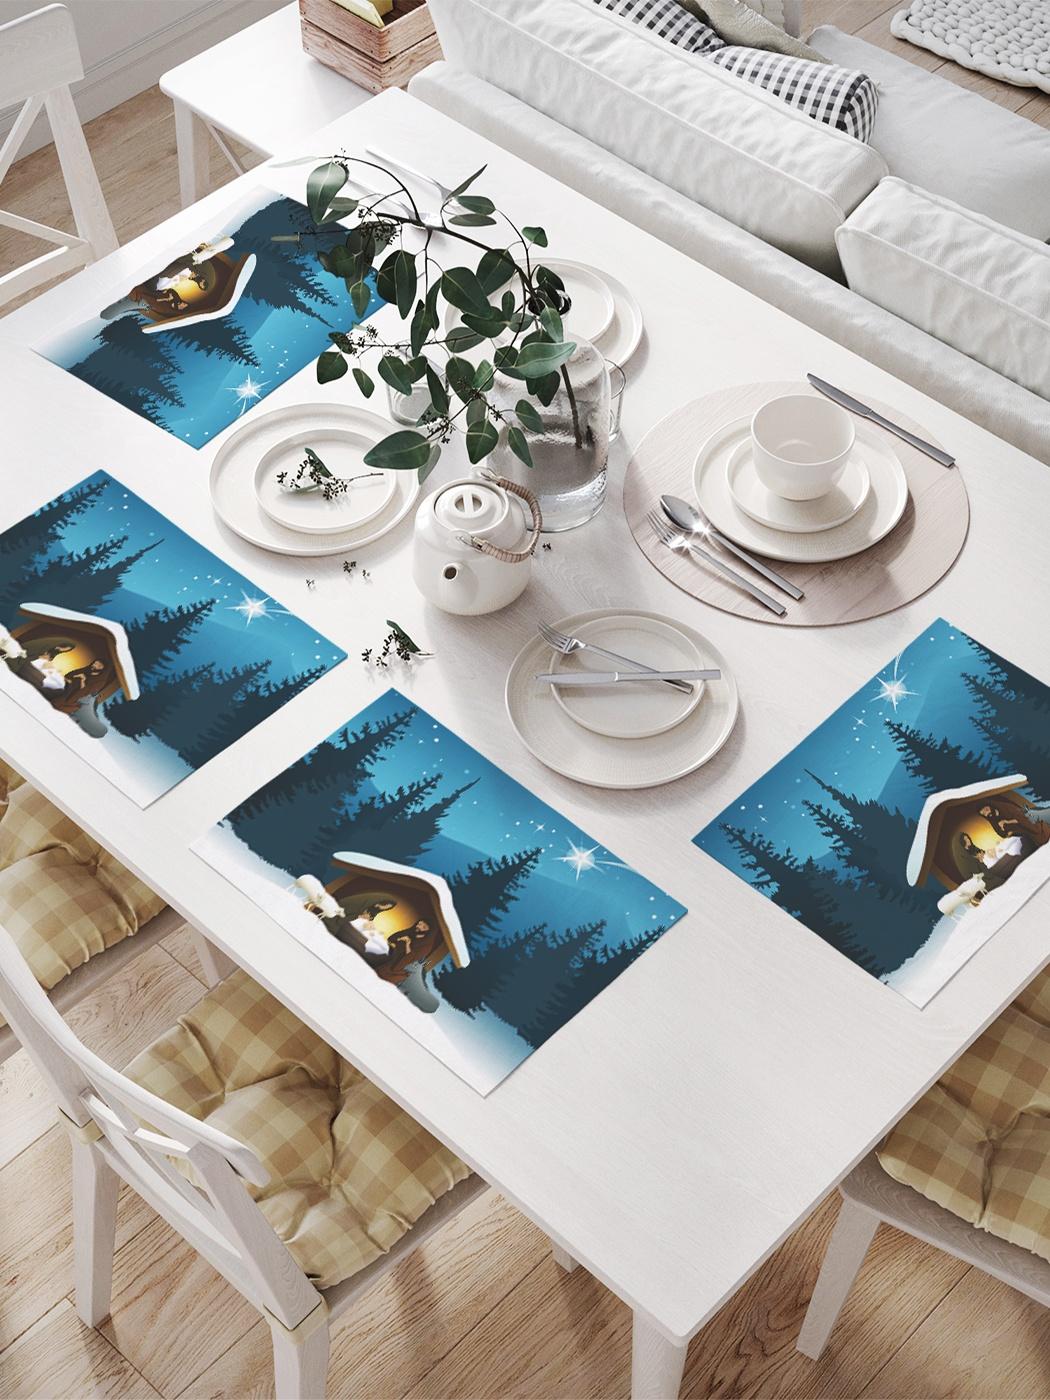 Комплект салфеток для сервировки стола «Звезда Рождества» (32х46 см, 4 шт.)